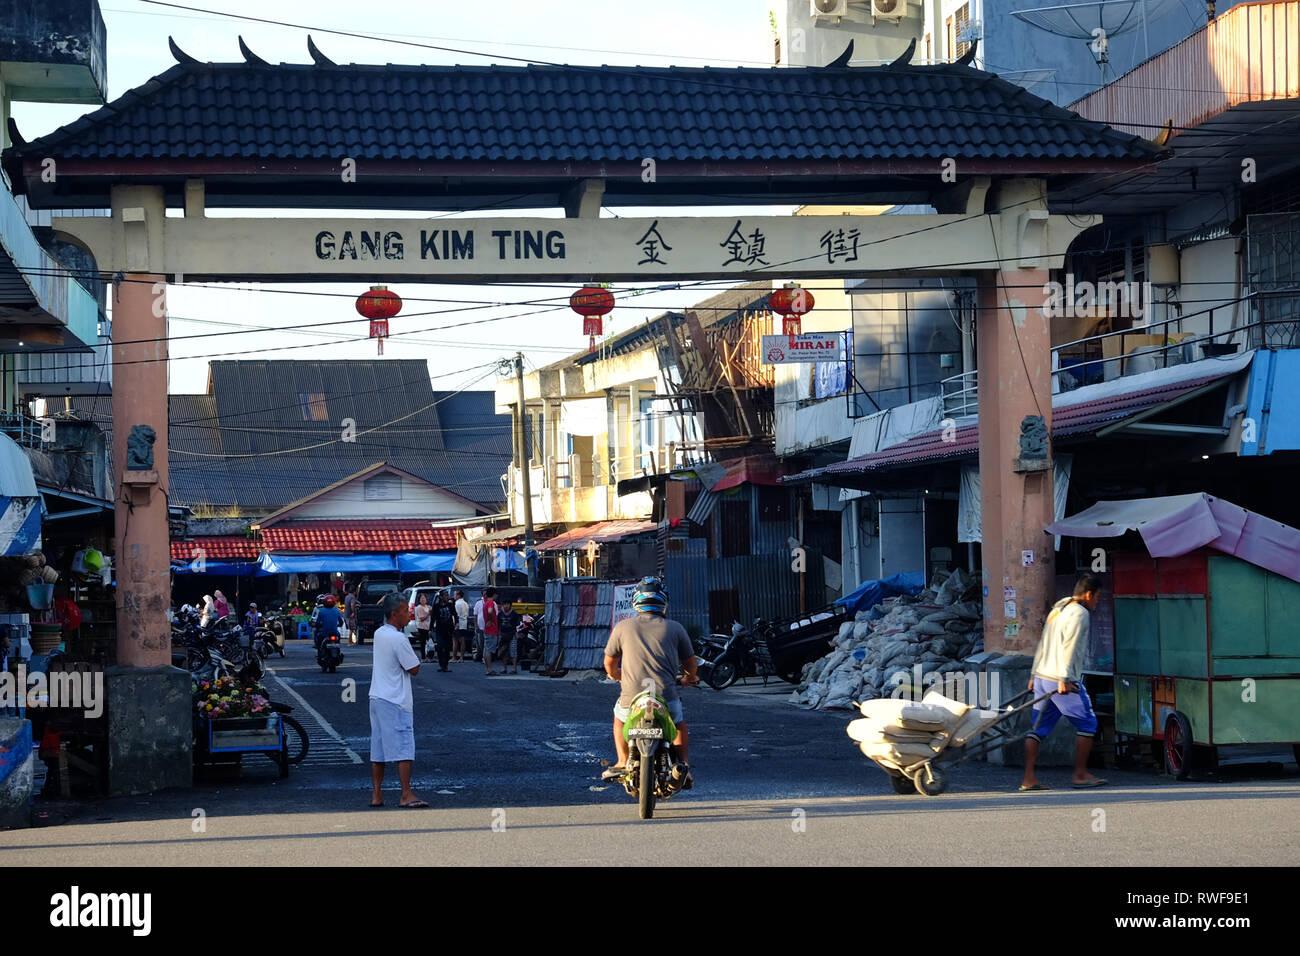 Gang Kim Ting Tanjung Pandan Belitung - Stock Image